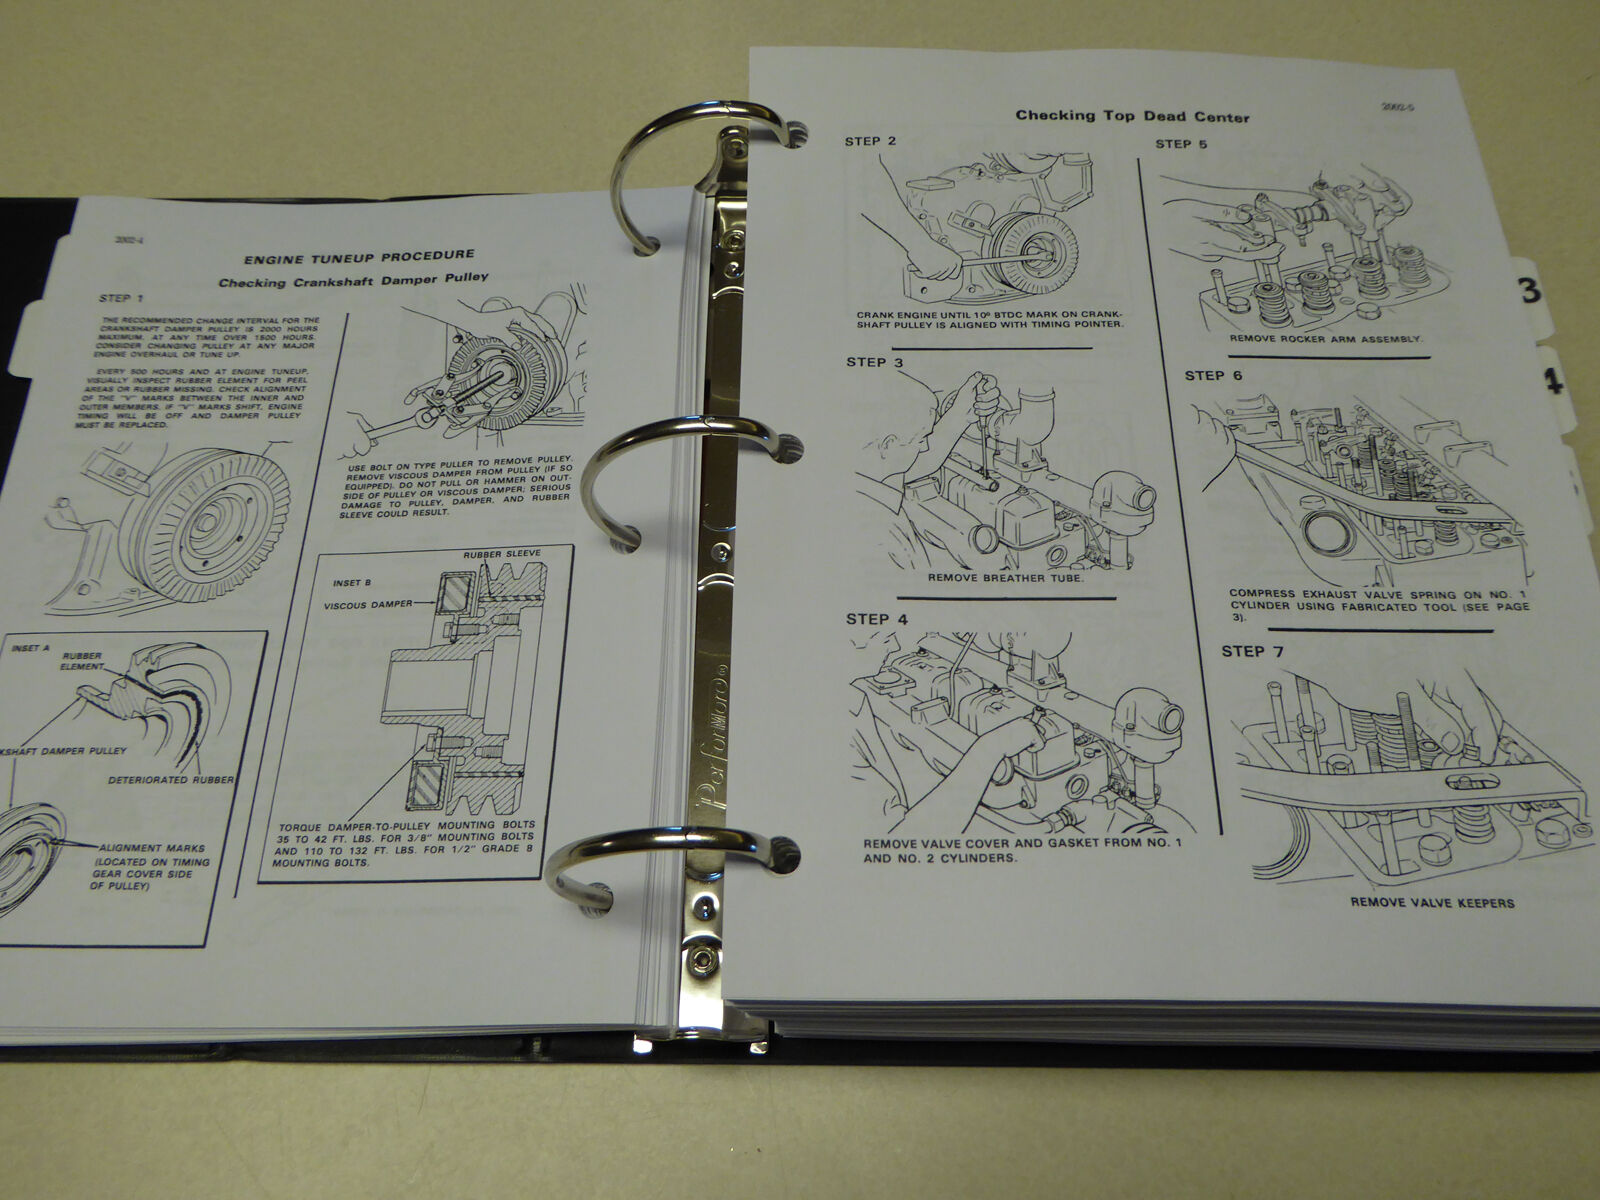 3 of 12 Case 850B Crawler Dozer Bulldozer Service Manual Repair Shop Book  NEW w/Binder 4 of 12 Case 850B Crawler Dozer Bulldozer Service Manual ...